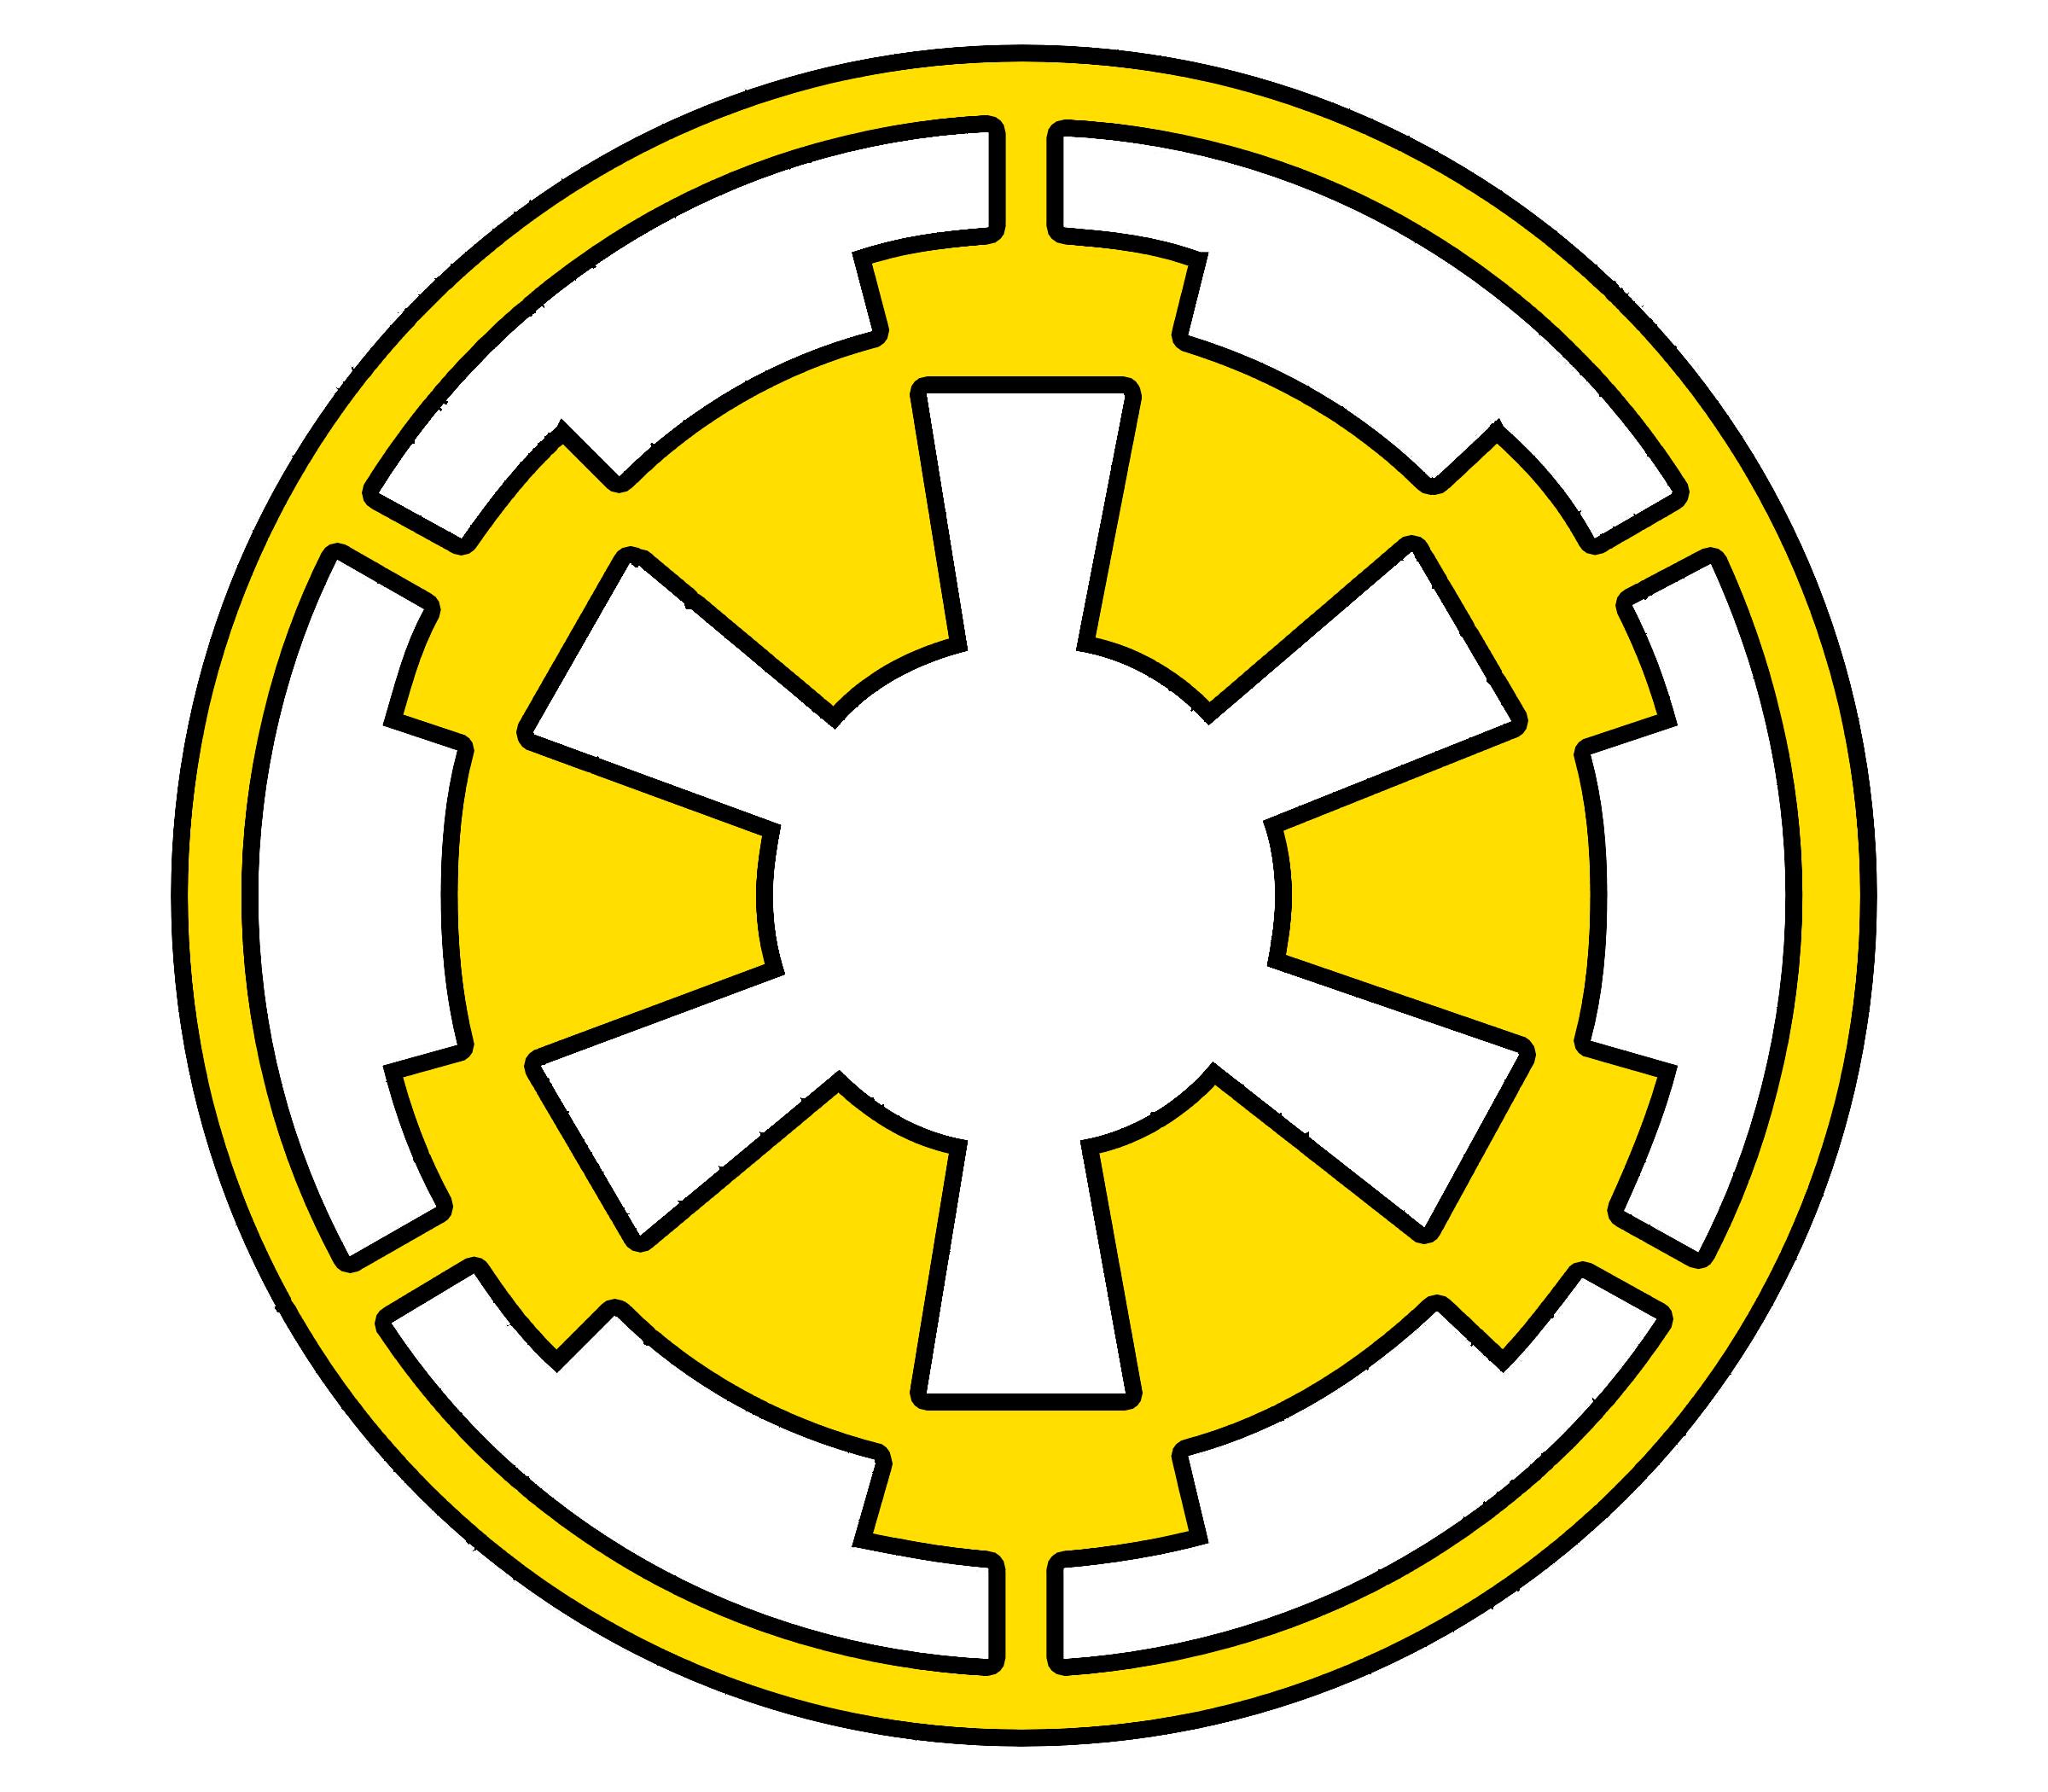 logo star wars histoire image de symbole et embl me. Black Bedroom Furniture Sets. Home Design Ideas